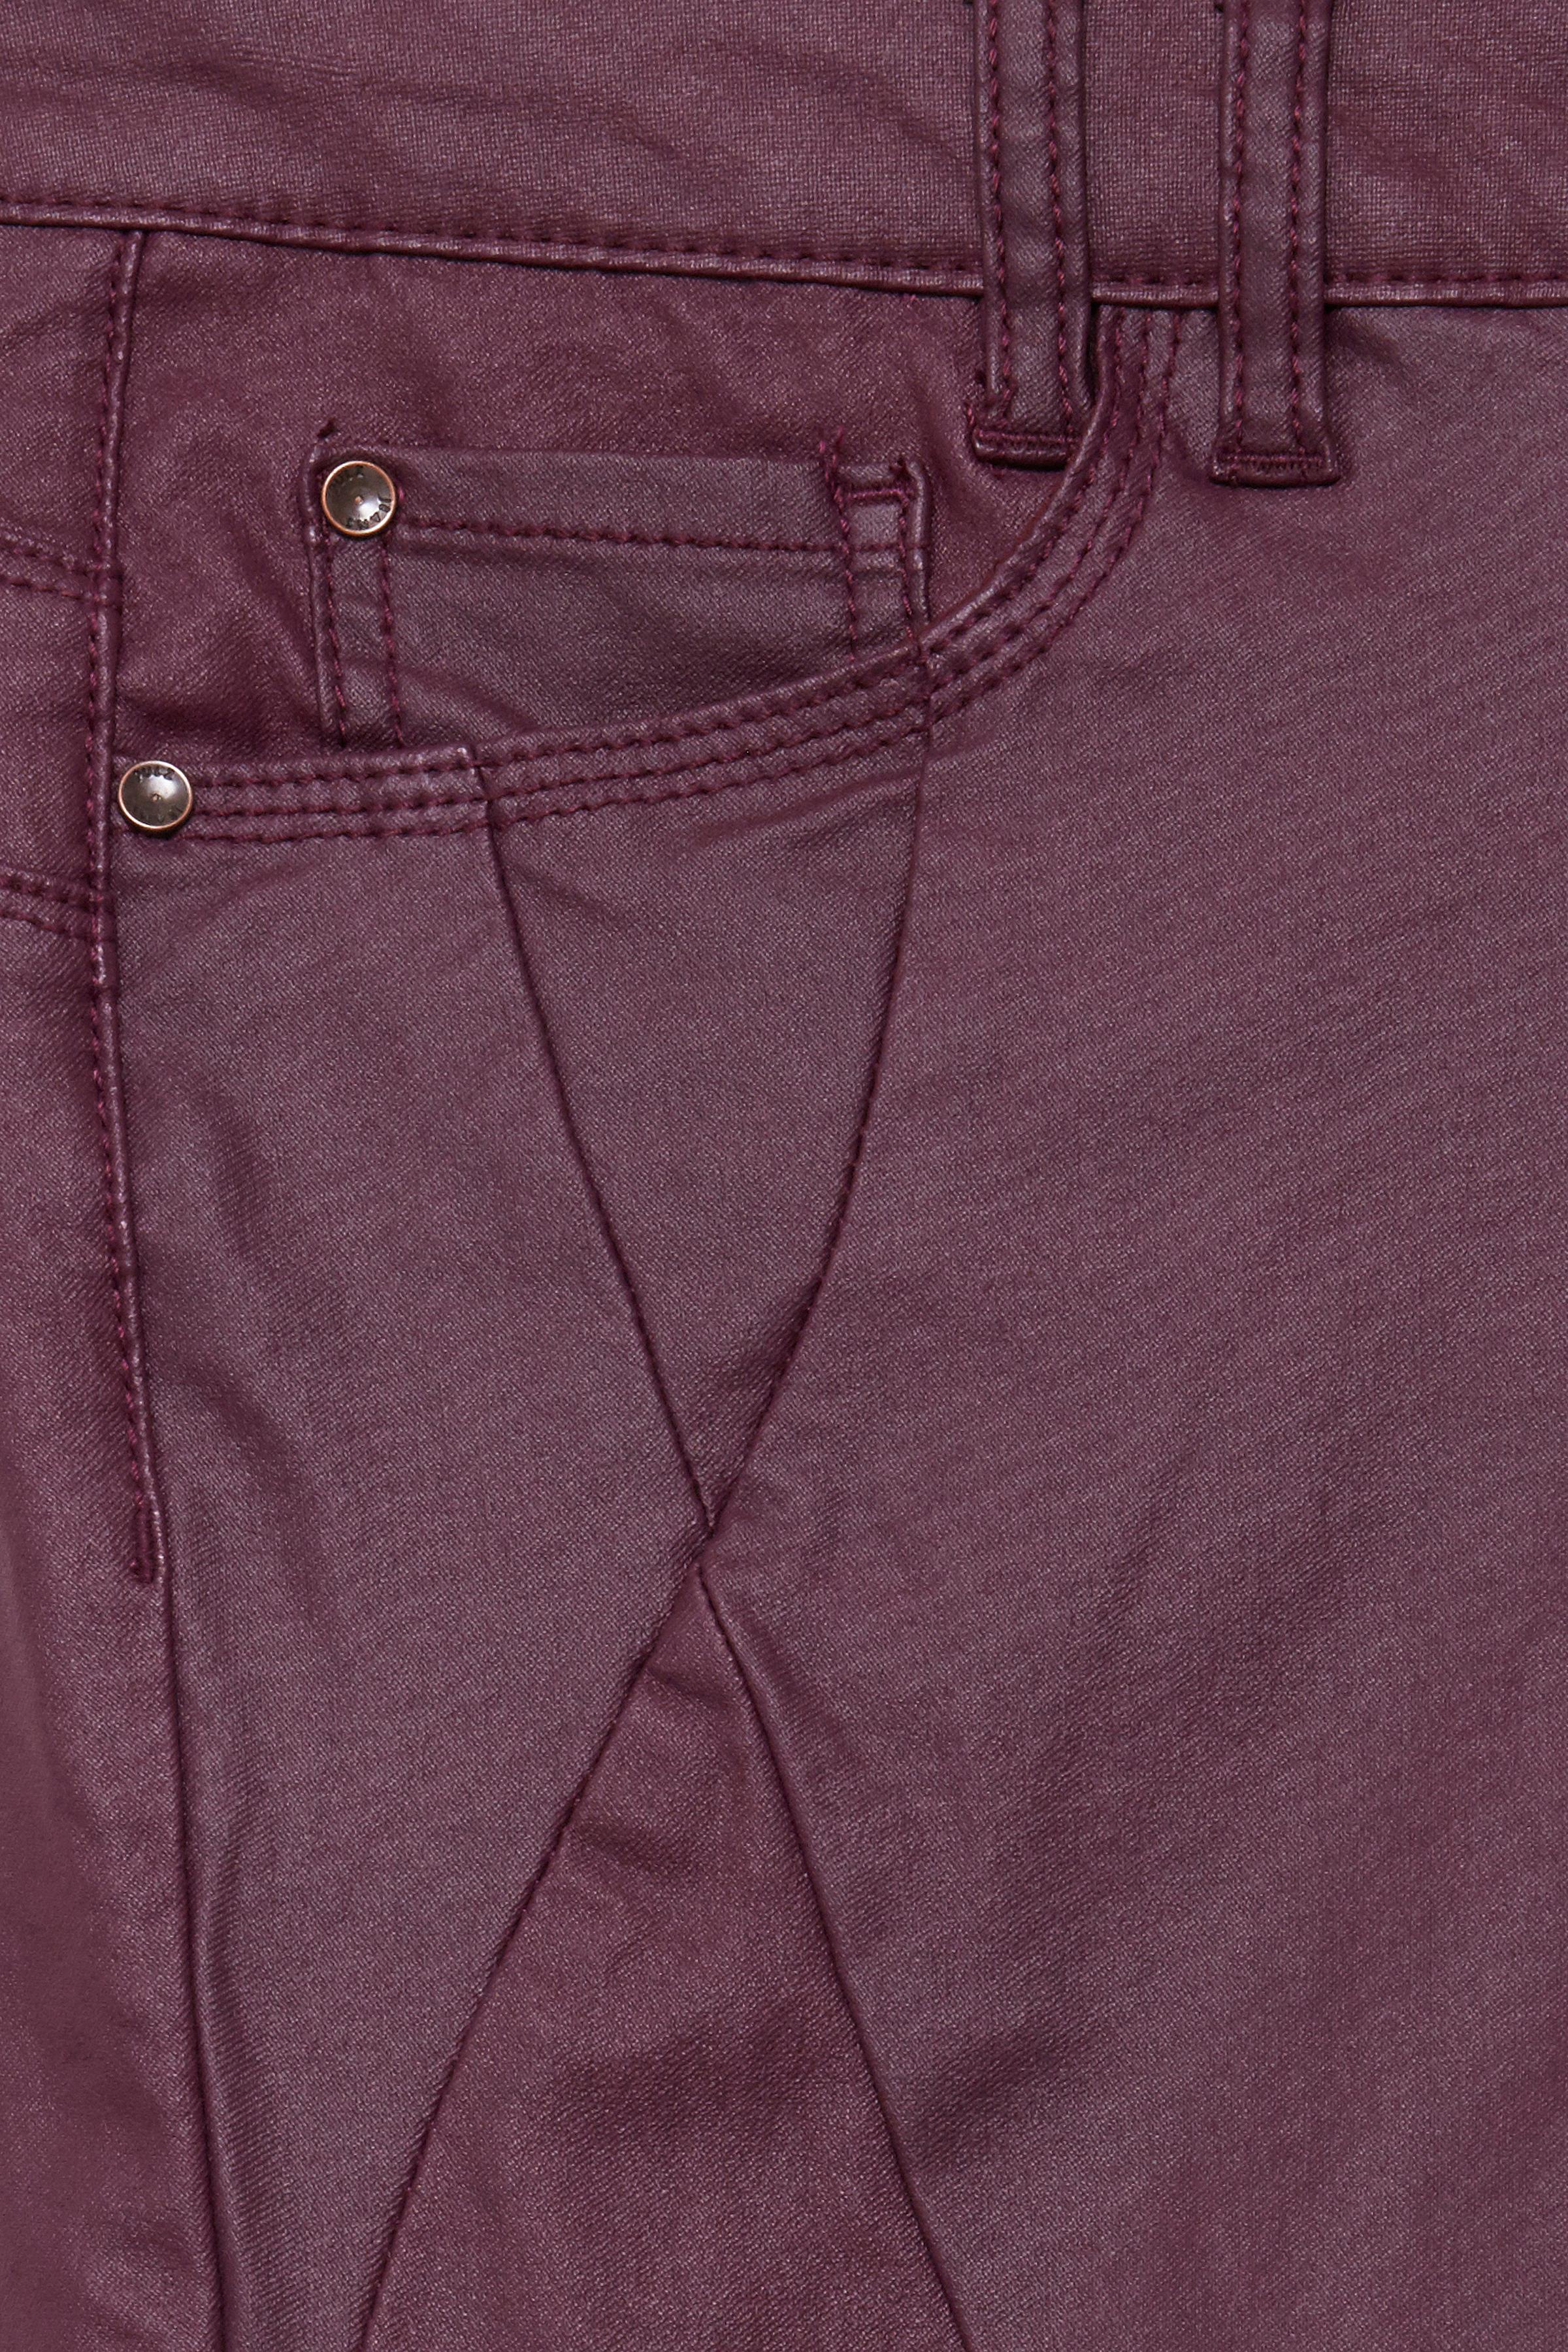 Bordeaux Casual byxor från Pulz Jeans – Köp Bordeaux Casual byxor från stl. 32-46 här